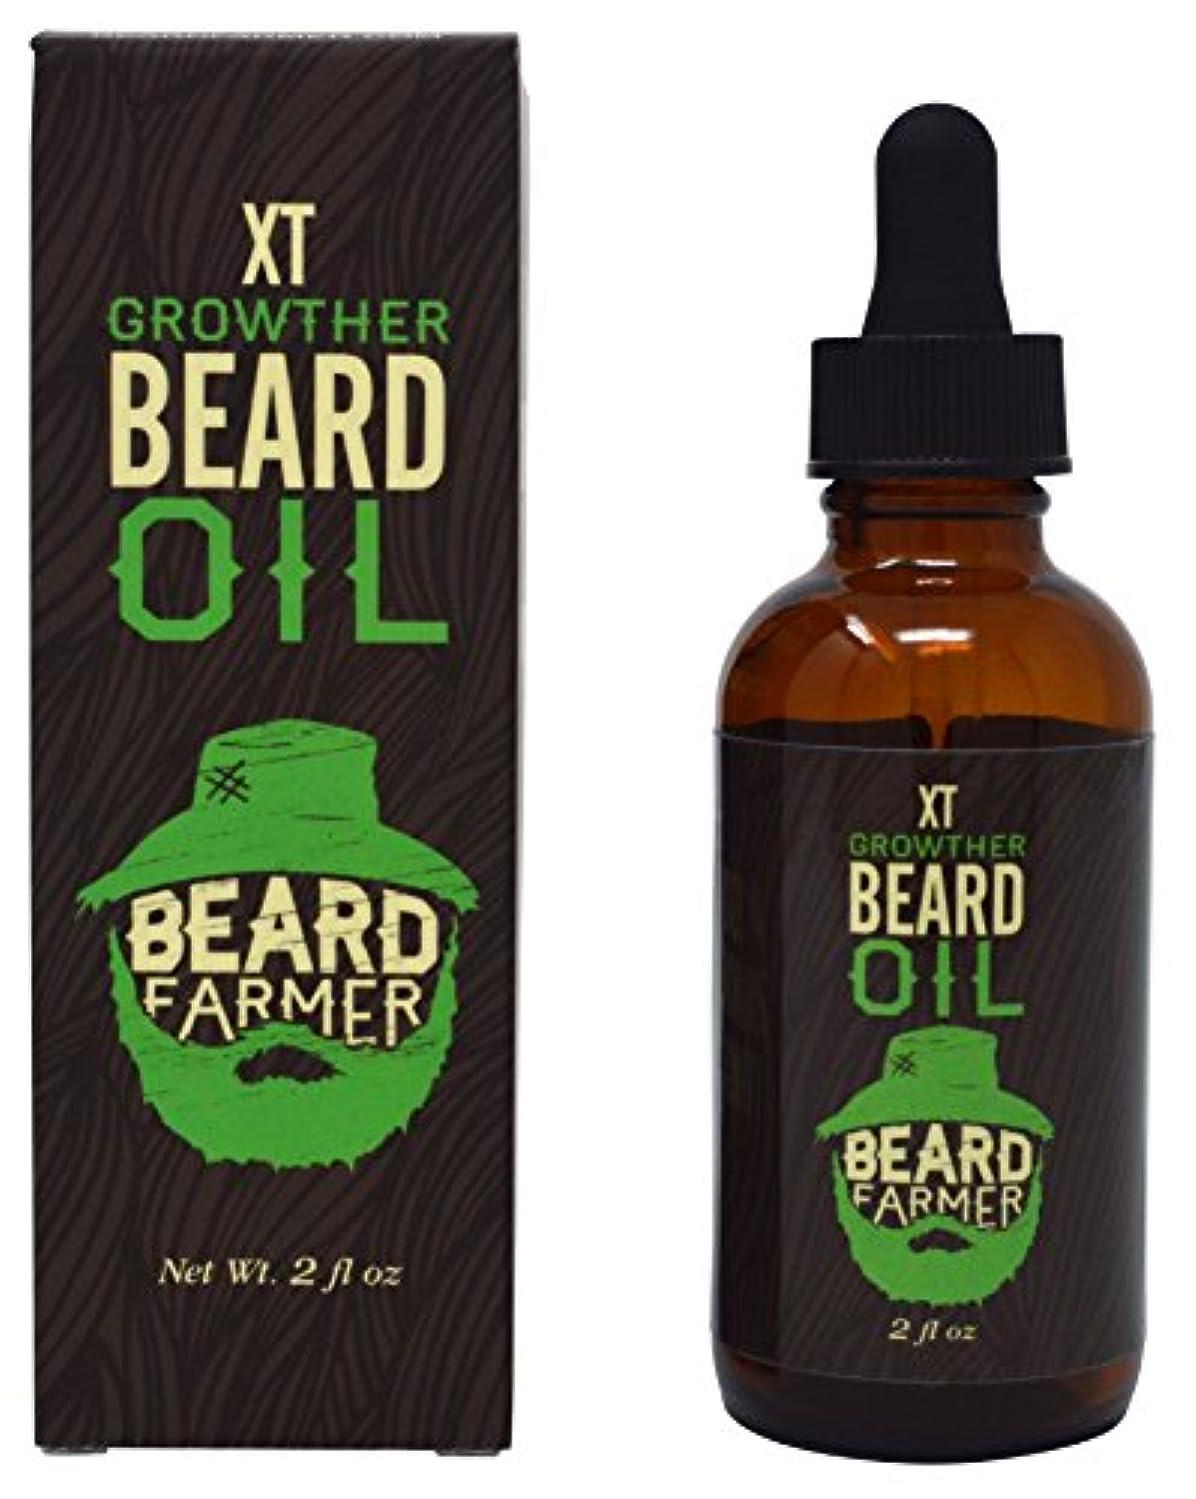 廊下炎上航空Beard Farmer - Growther XT Beard Oil (Extra Fast Beard Growth) All Natural Beard Growth Oil 2floz